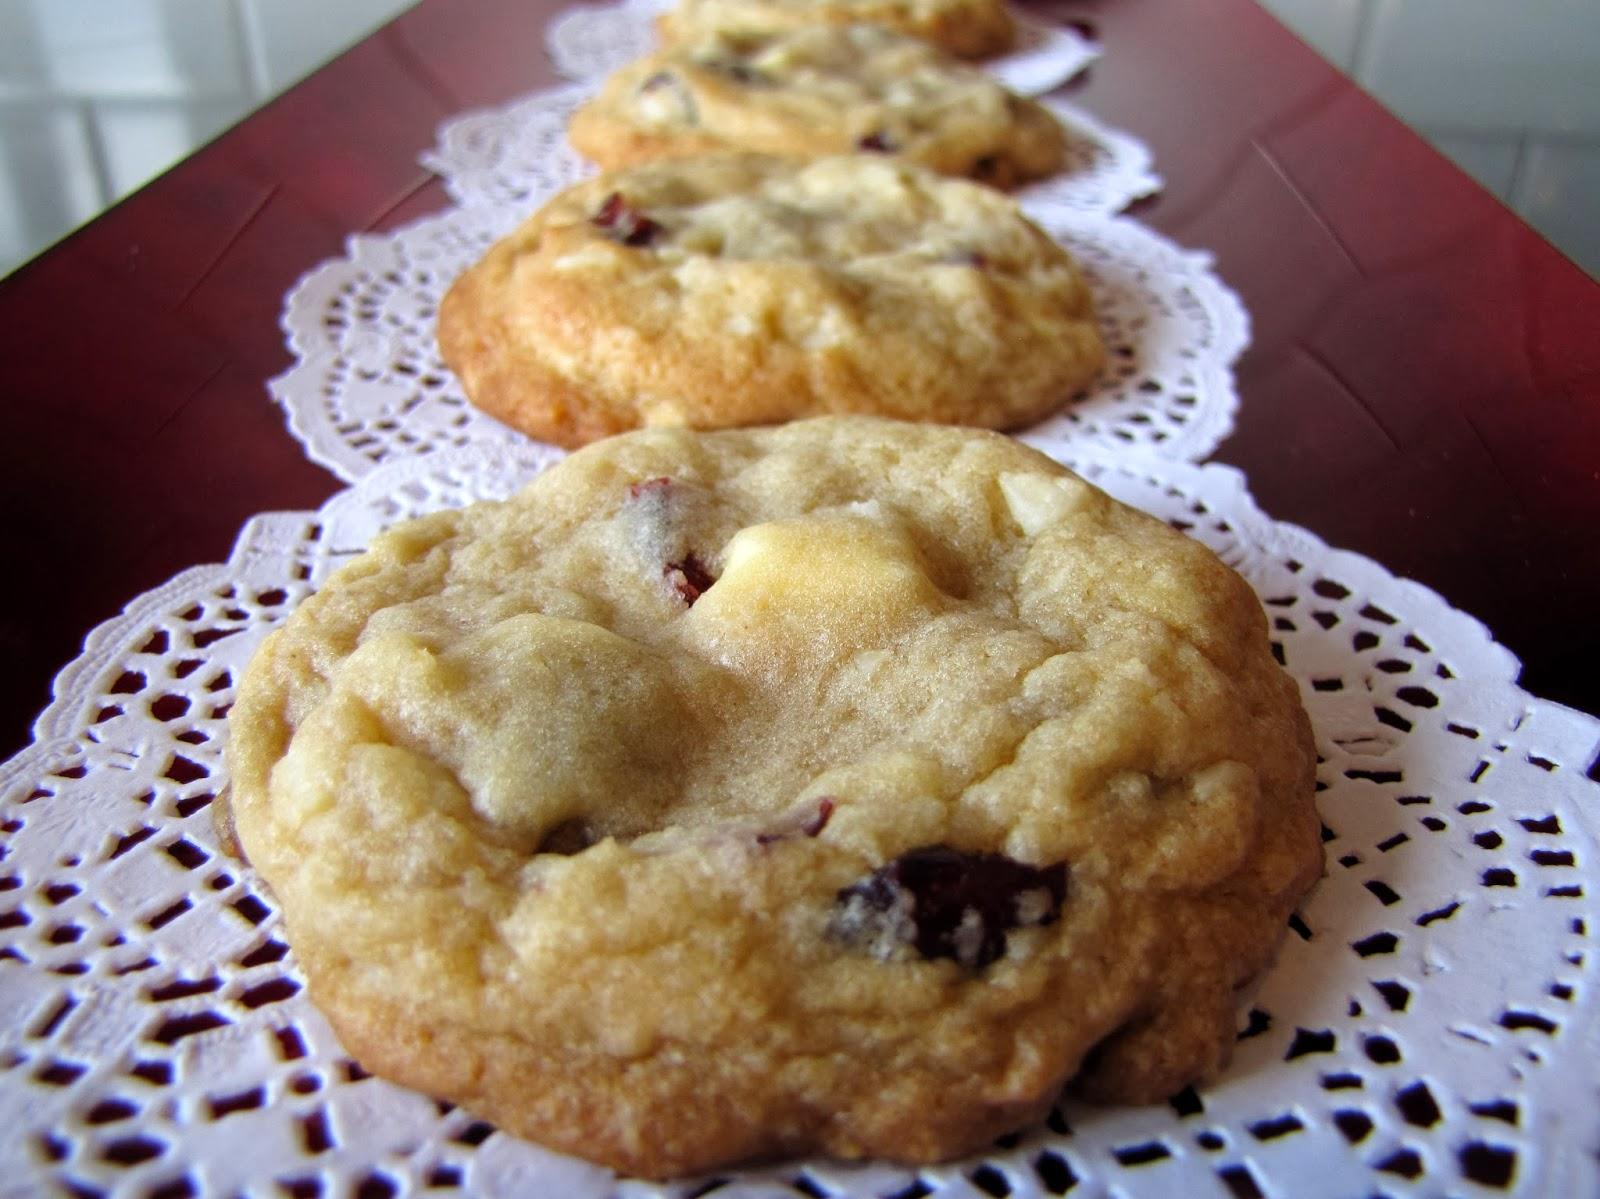 Mennonite Girls Can Cook: White Chocolate Macadamia Nut Cookies